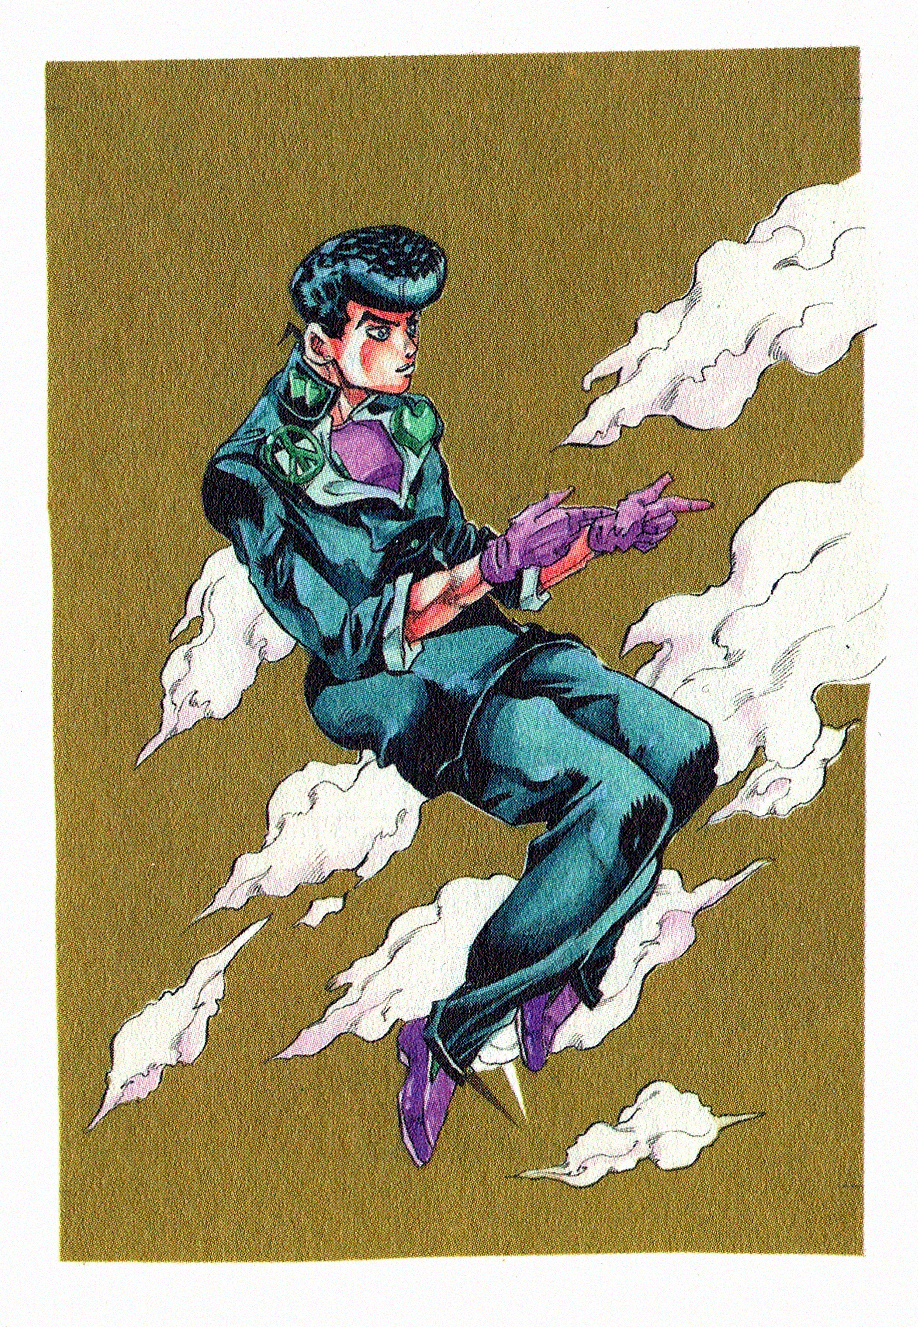 Josuke Higashikata Jojo Anime Jojo S Bizarre Adventure Characters Jojo Bizzare Adventure